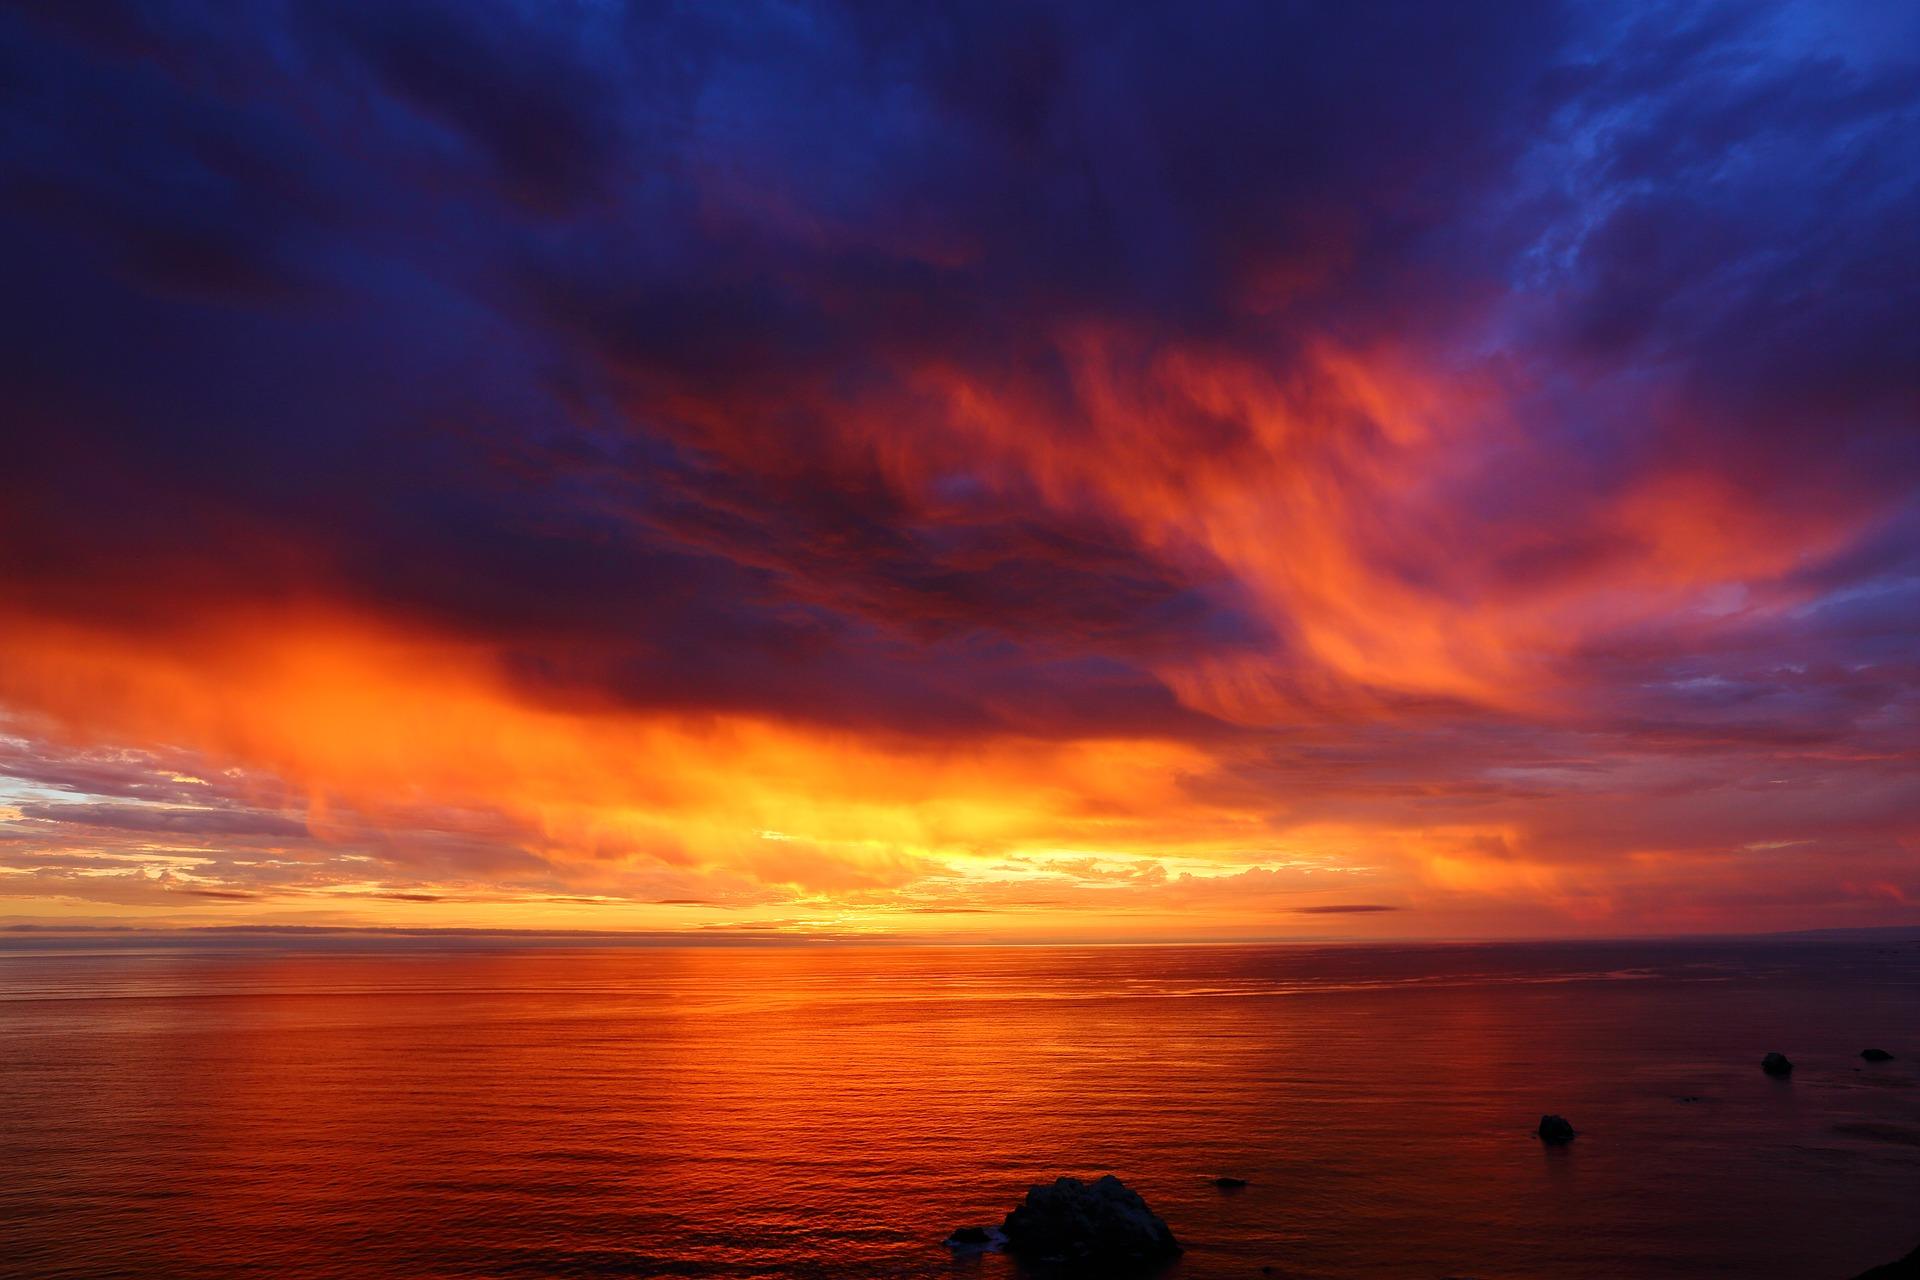 sunset-1908282_1920